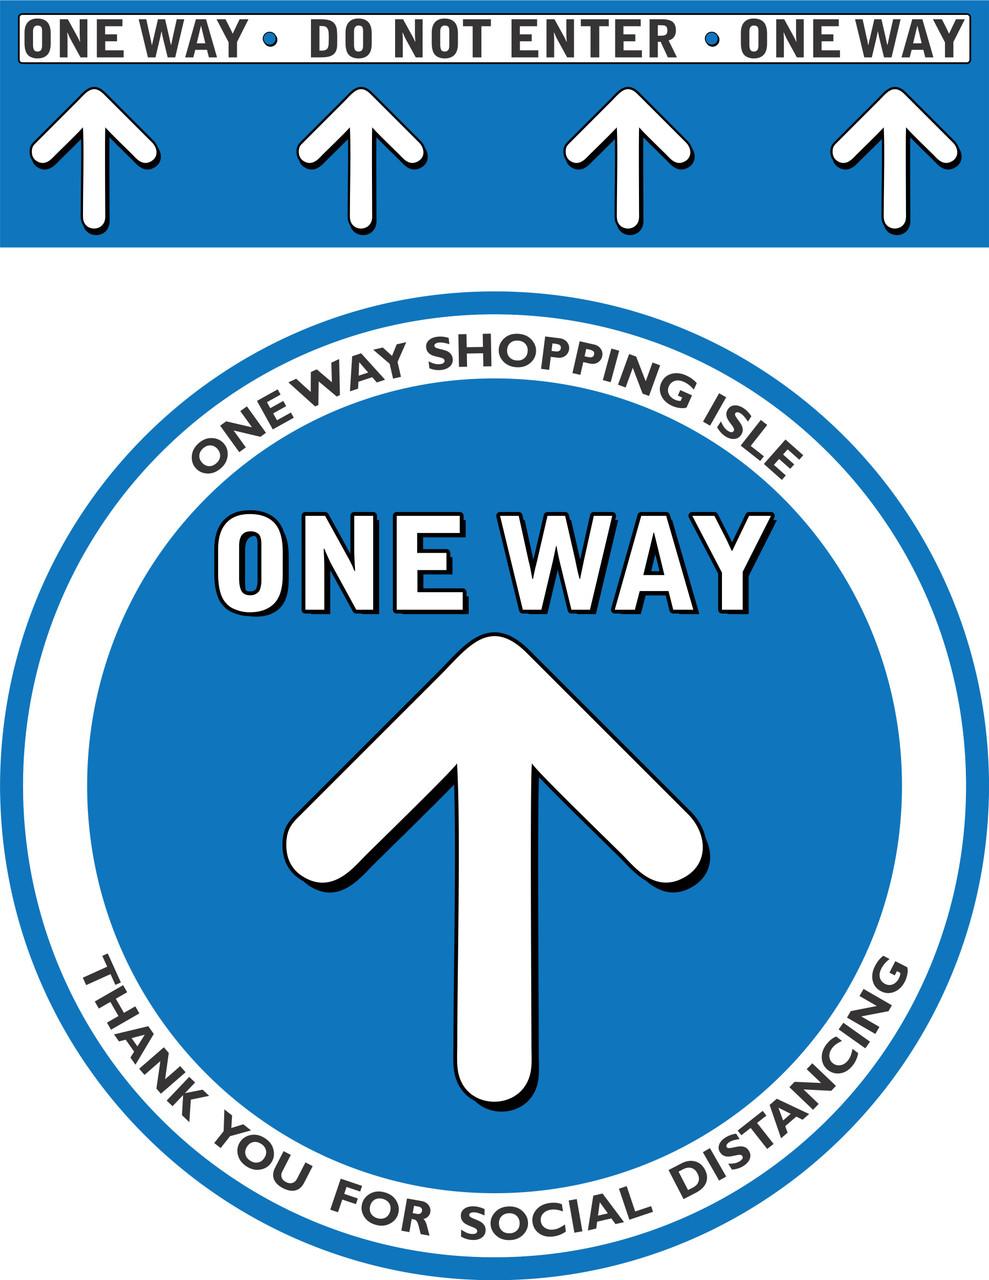 One way Social Distancing Floor Decal | Covid-19 Floor Sticker | Coronavirus Floor Decal | Social Distancing Floor Sign | Pandemic Floor Sticker | Do Not Enter Floor Sticker